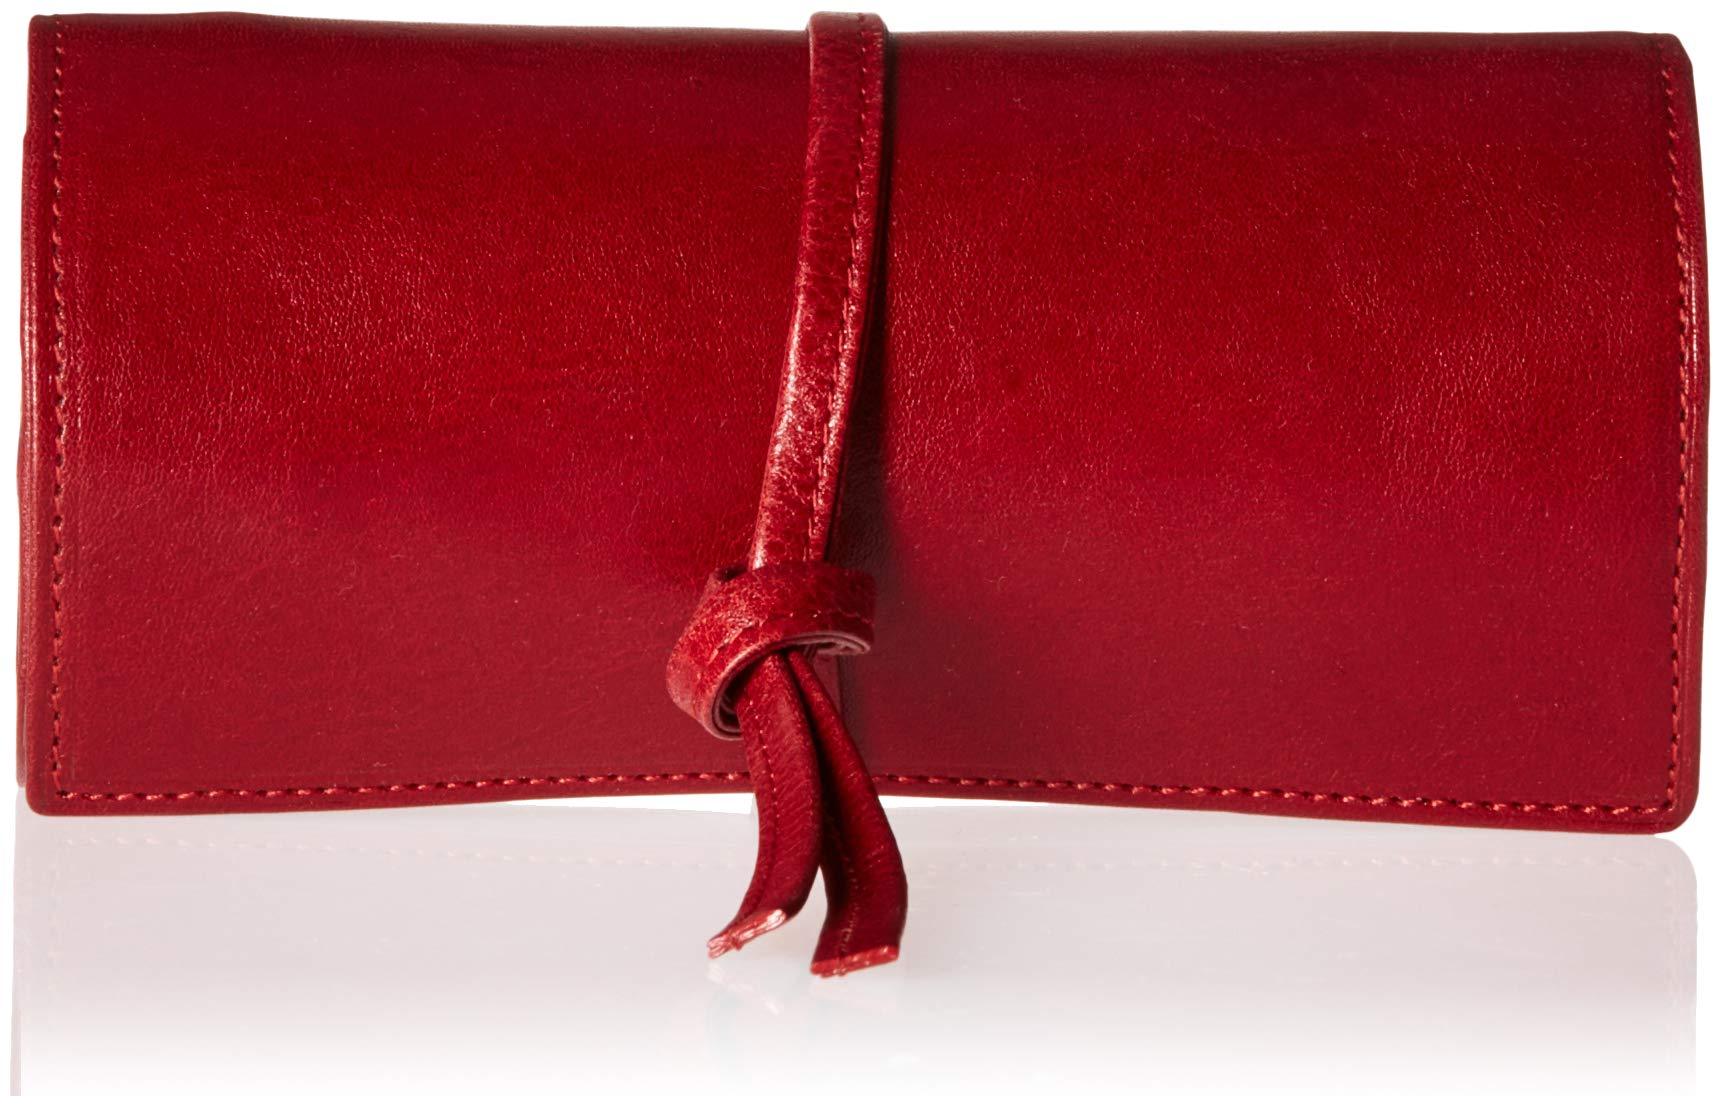 Tony Perotti Italian Bull Leather Grande Jewelry Roll Travel Organizer